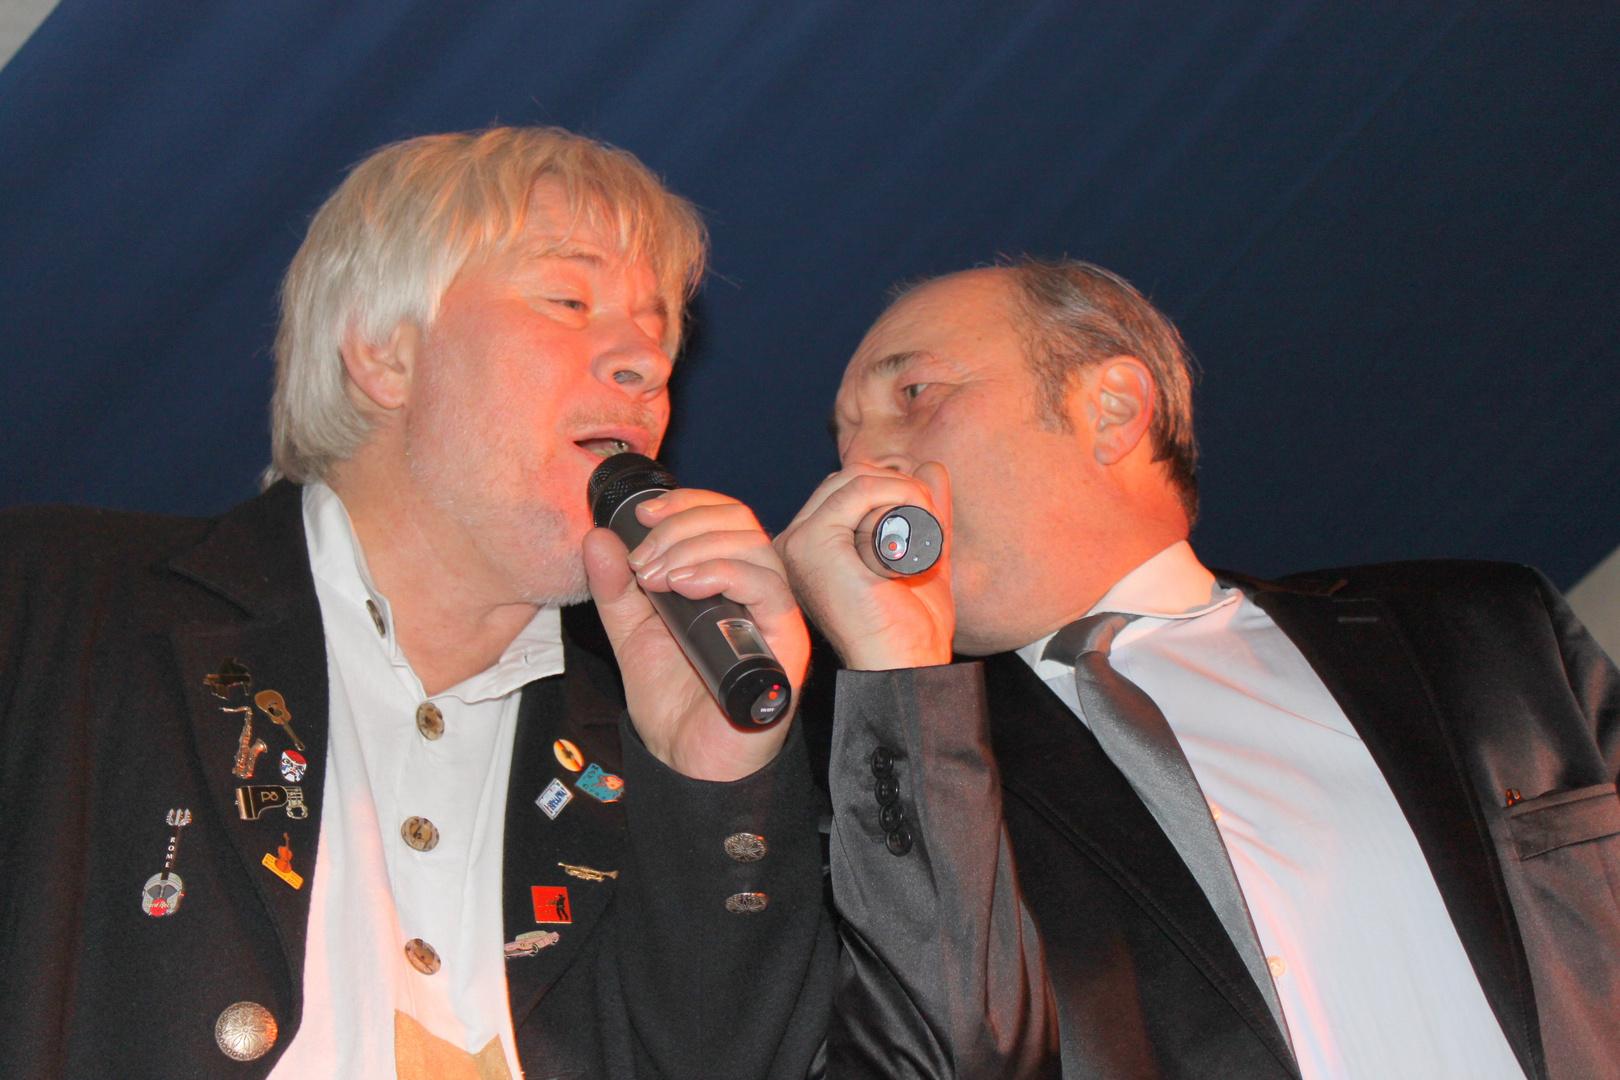 Peter Petrel und Volker Stahlhut (NDR)